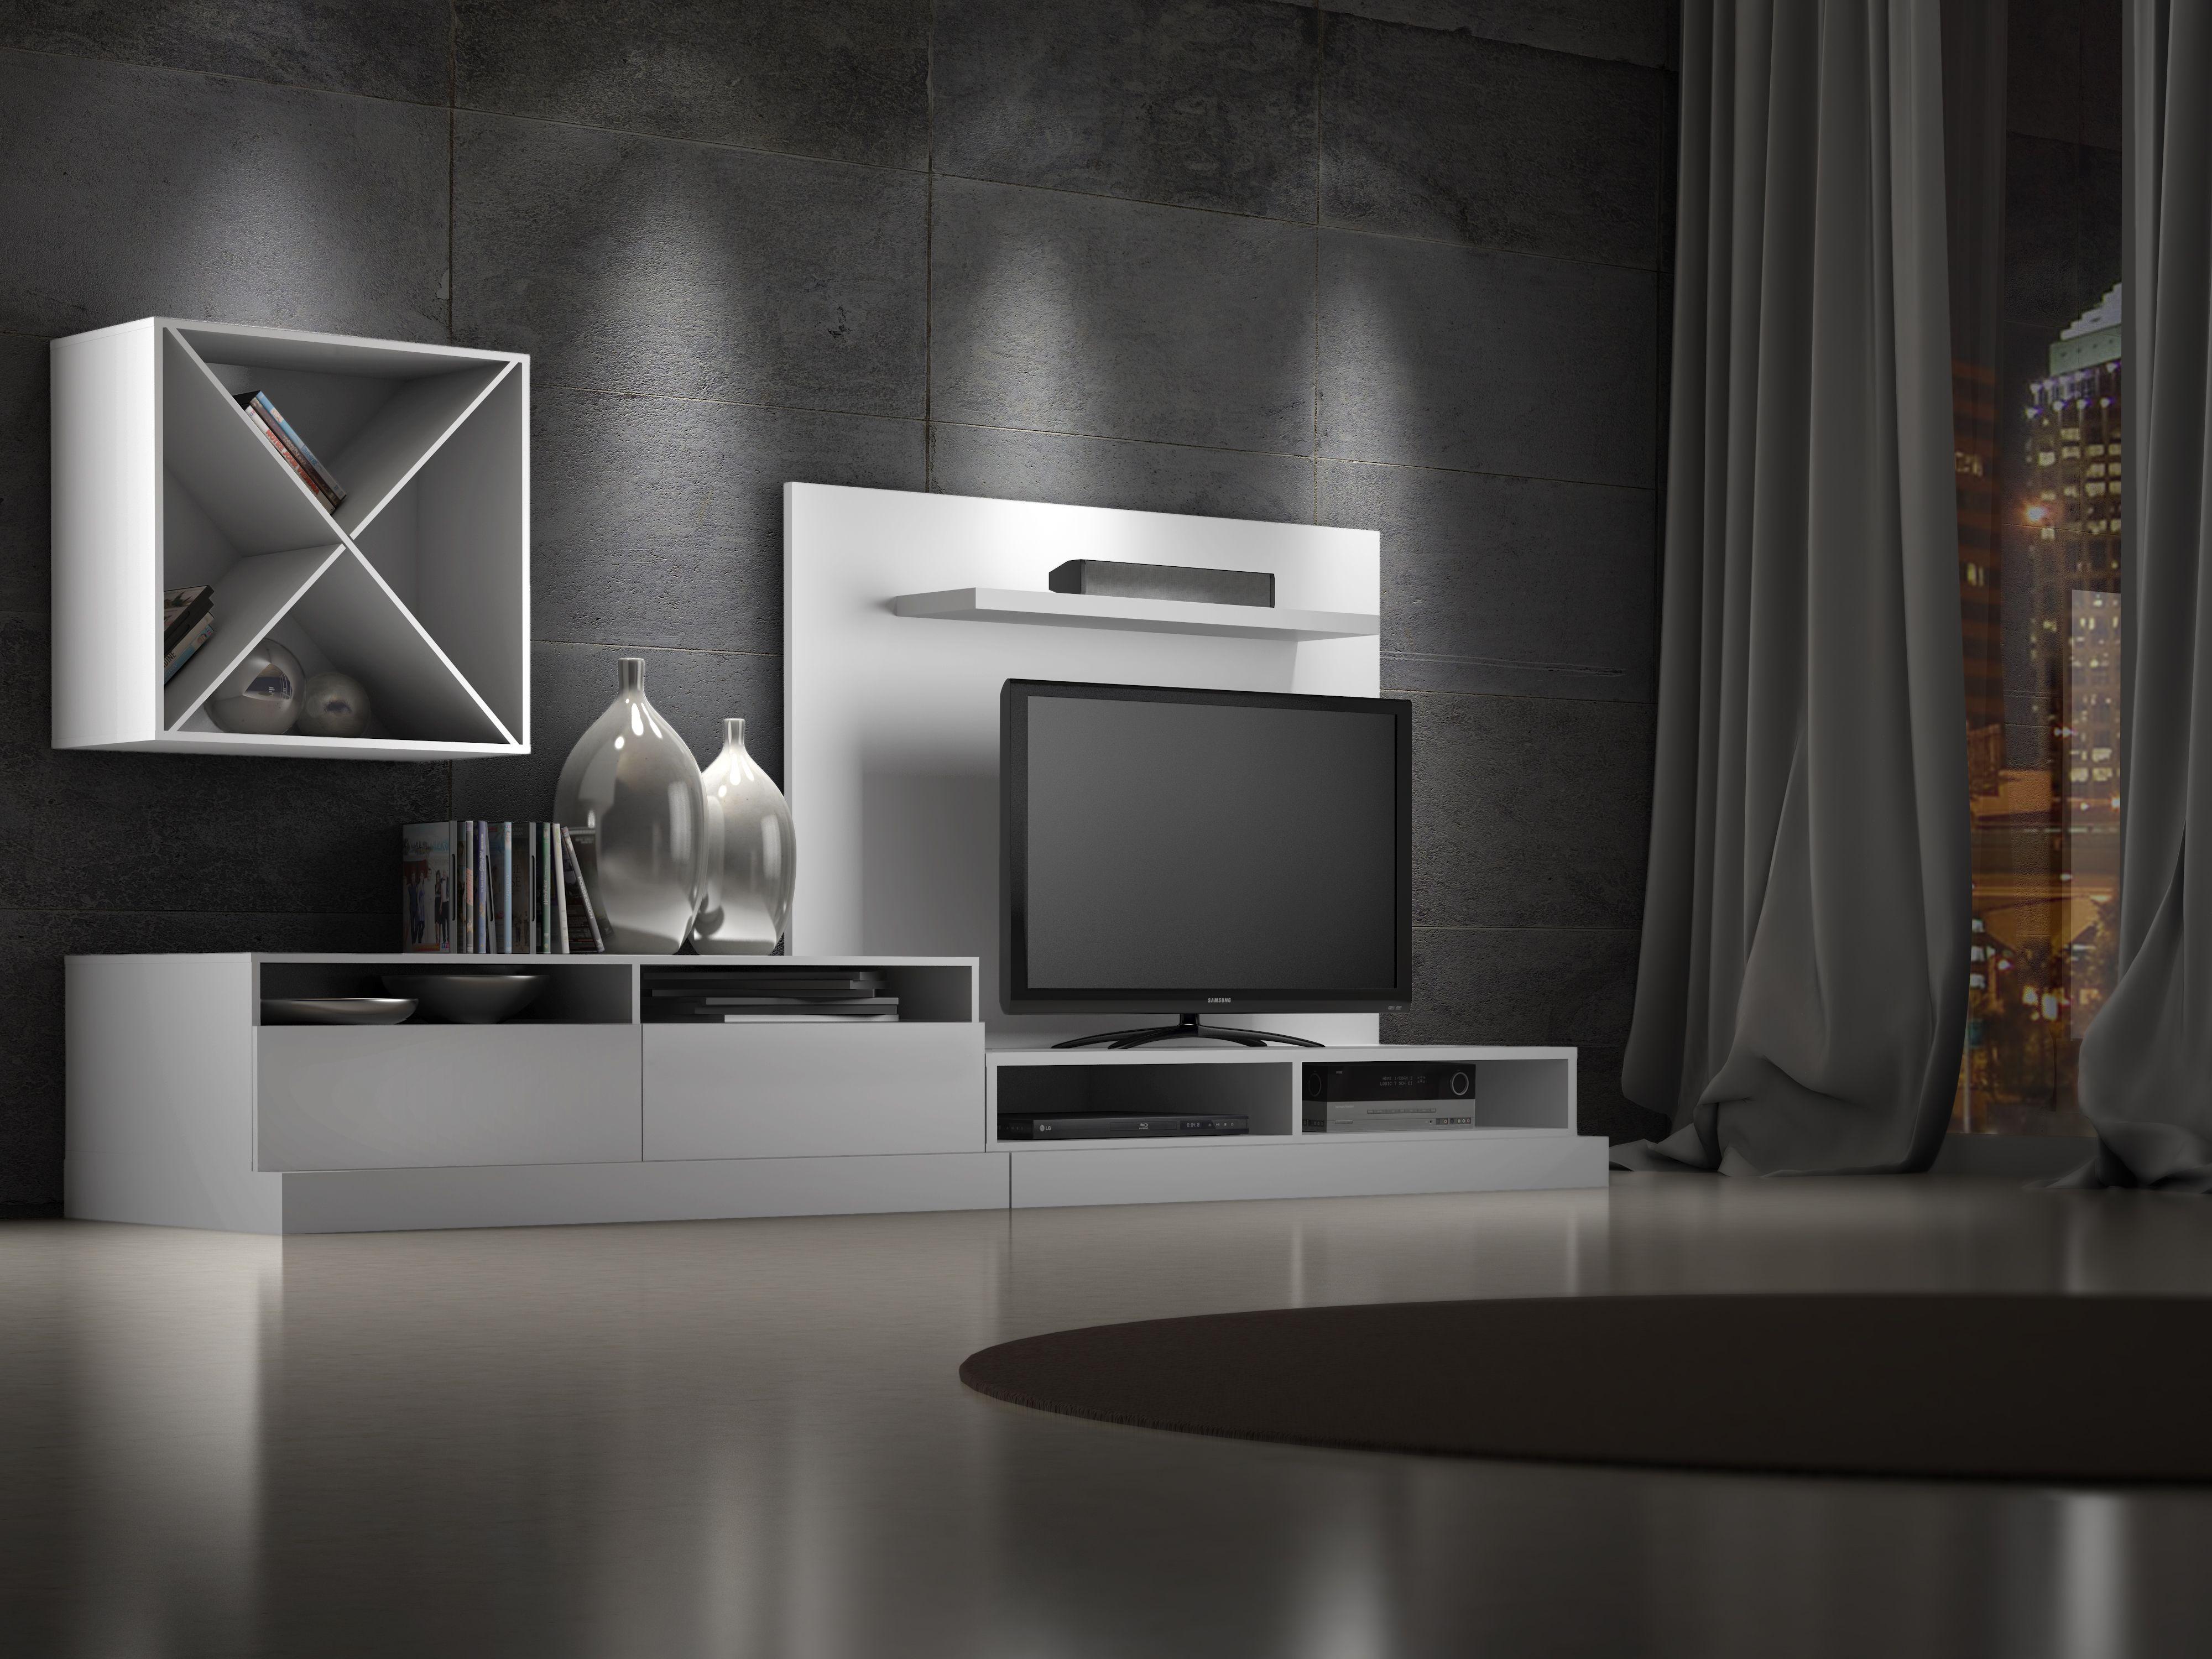 syne createch design elegant modern design mediastorage livingroom